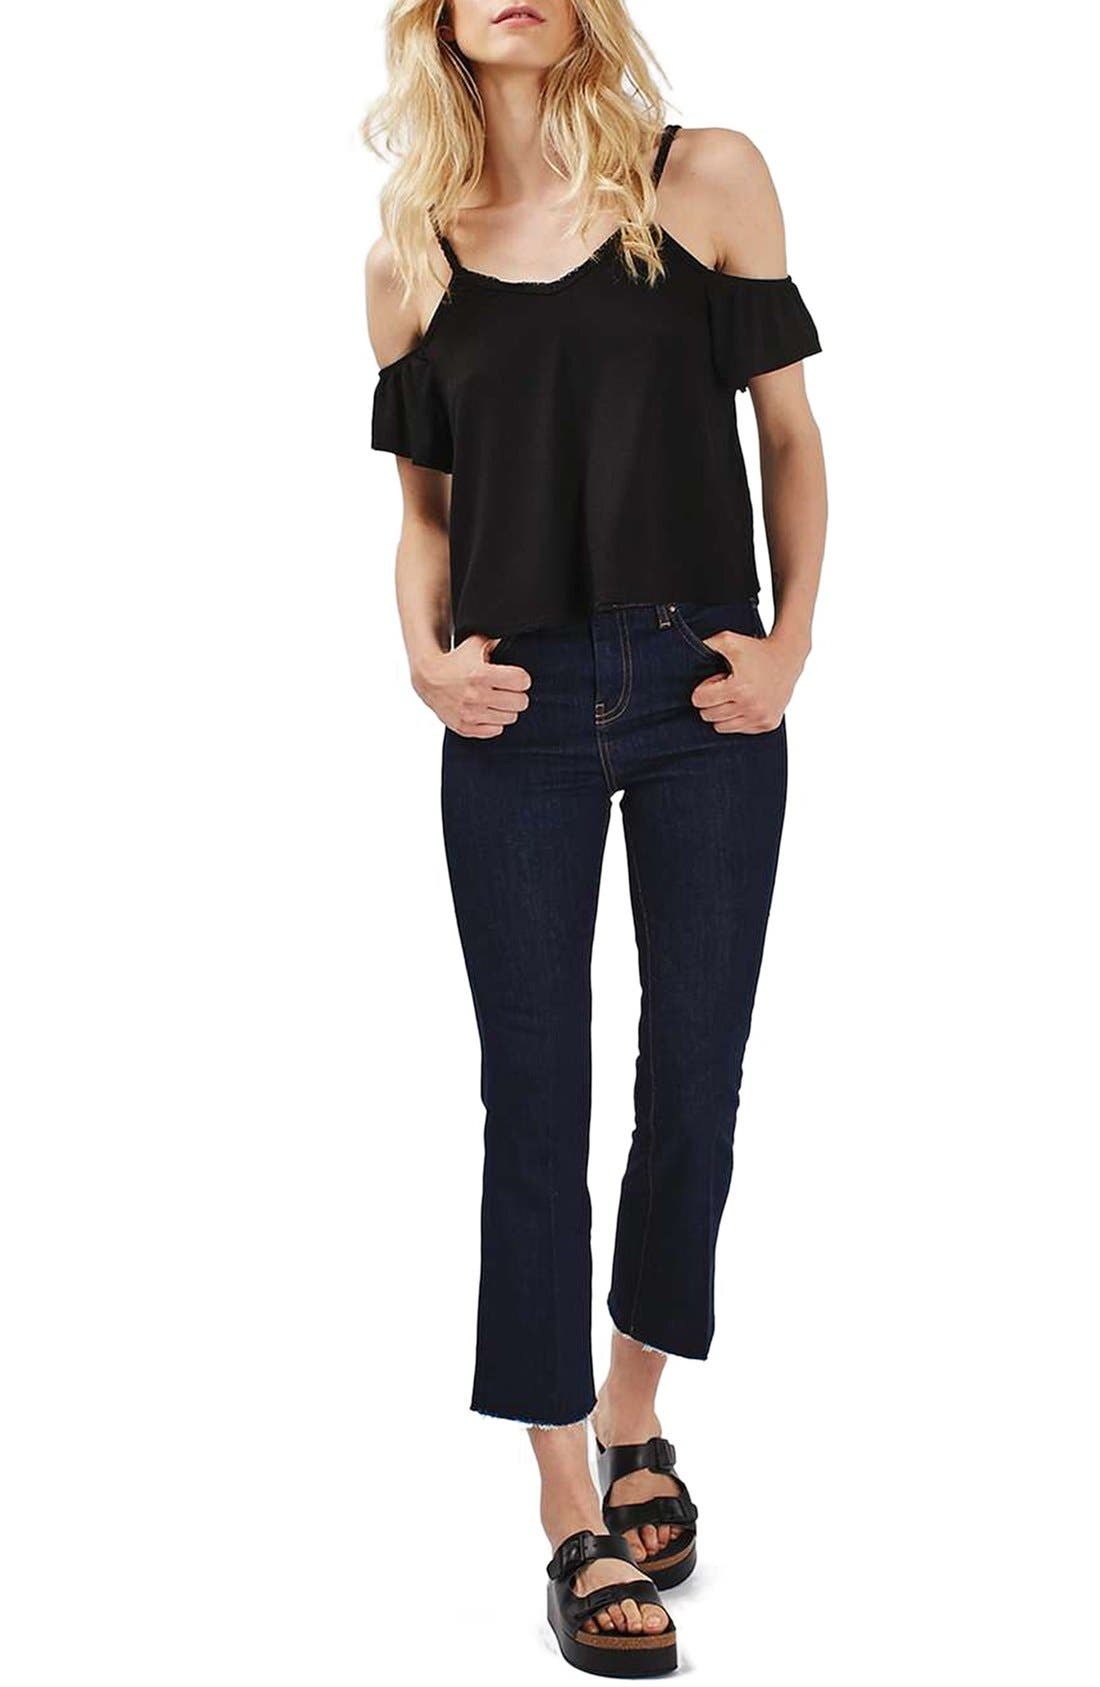 Alternate Image 1 Selected - Topshop Short Sleeve Ruffle Bardot Top (Regular & Petite)